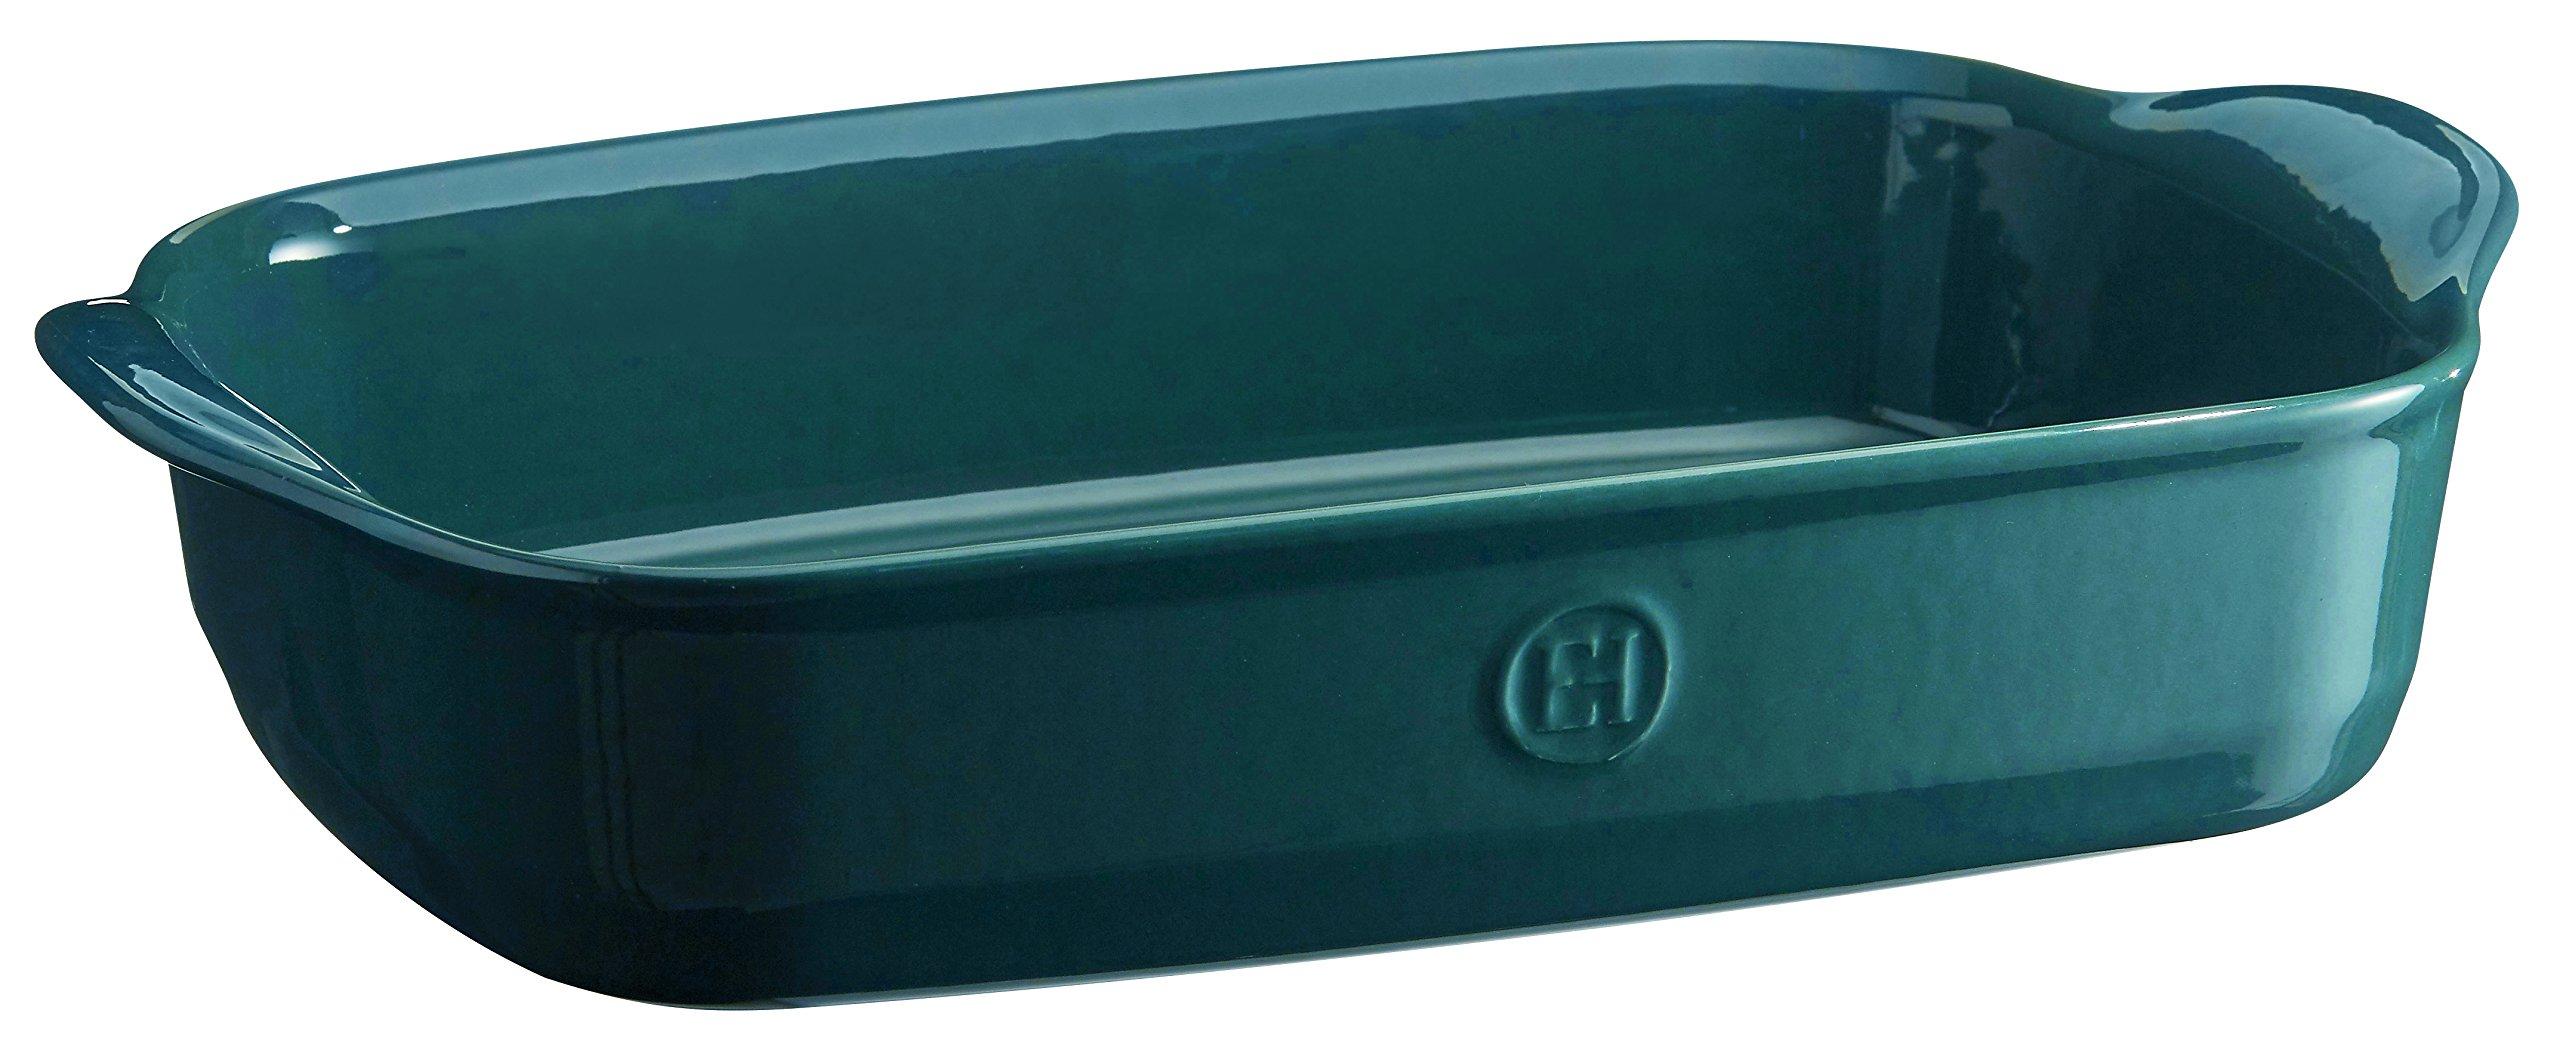 Emile Henry 979652 France Ovenware Ultime Rectangular Baking Dish, 14.2 x 9.1, Blue by Emile Henry